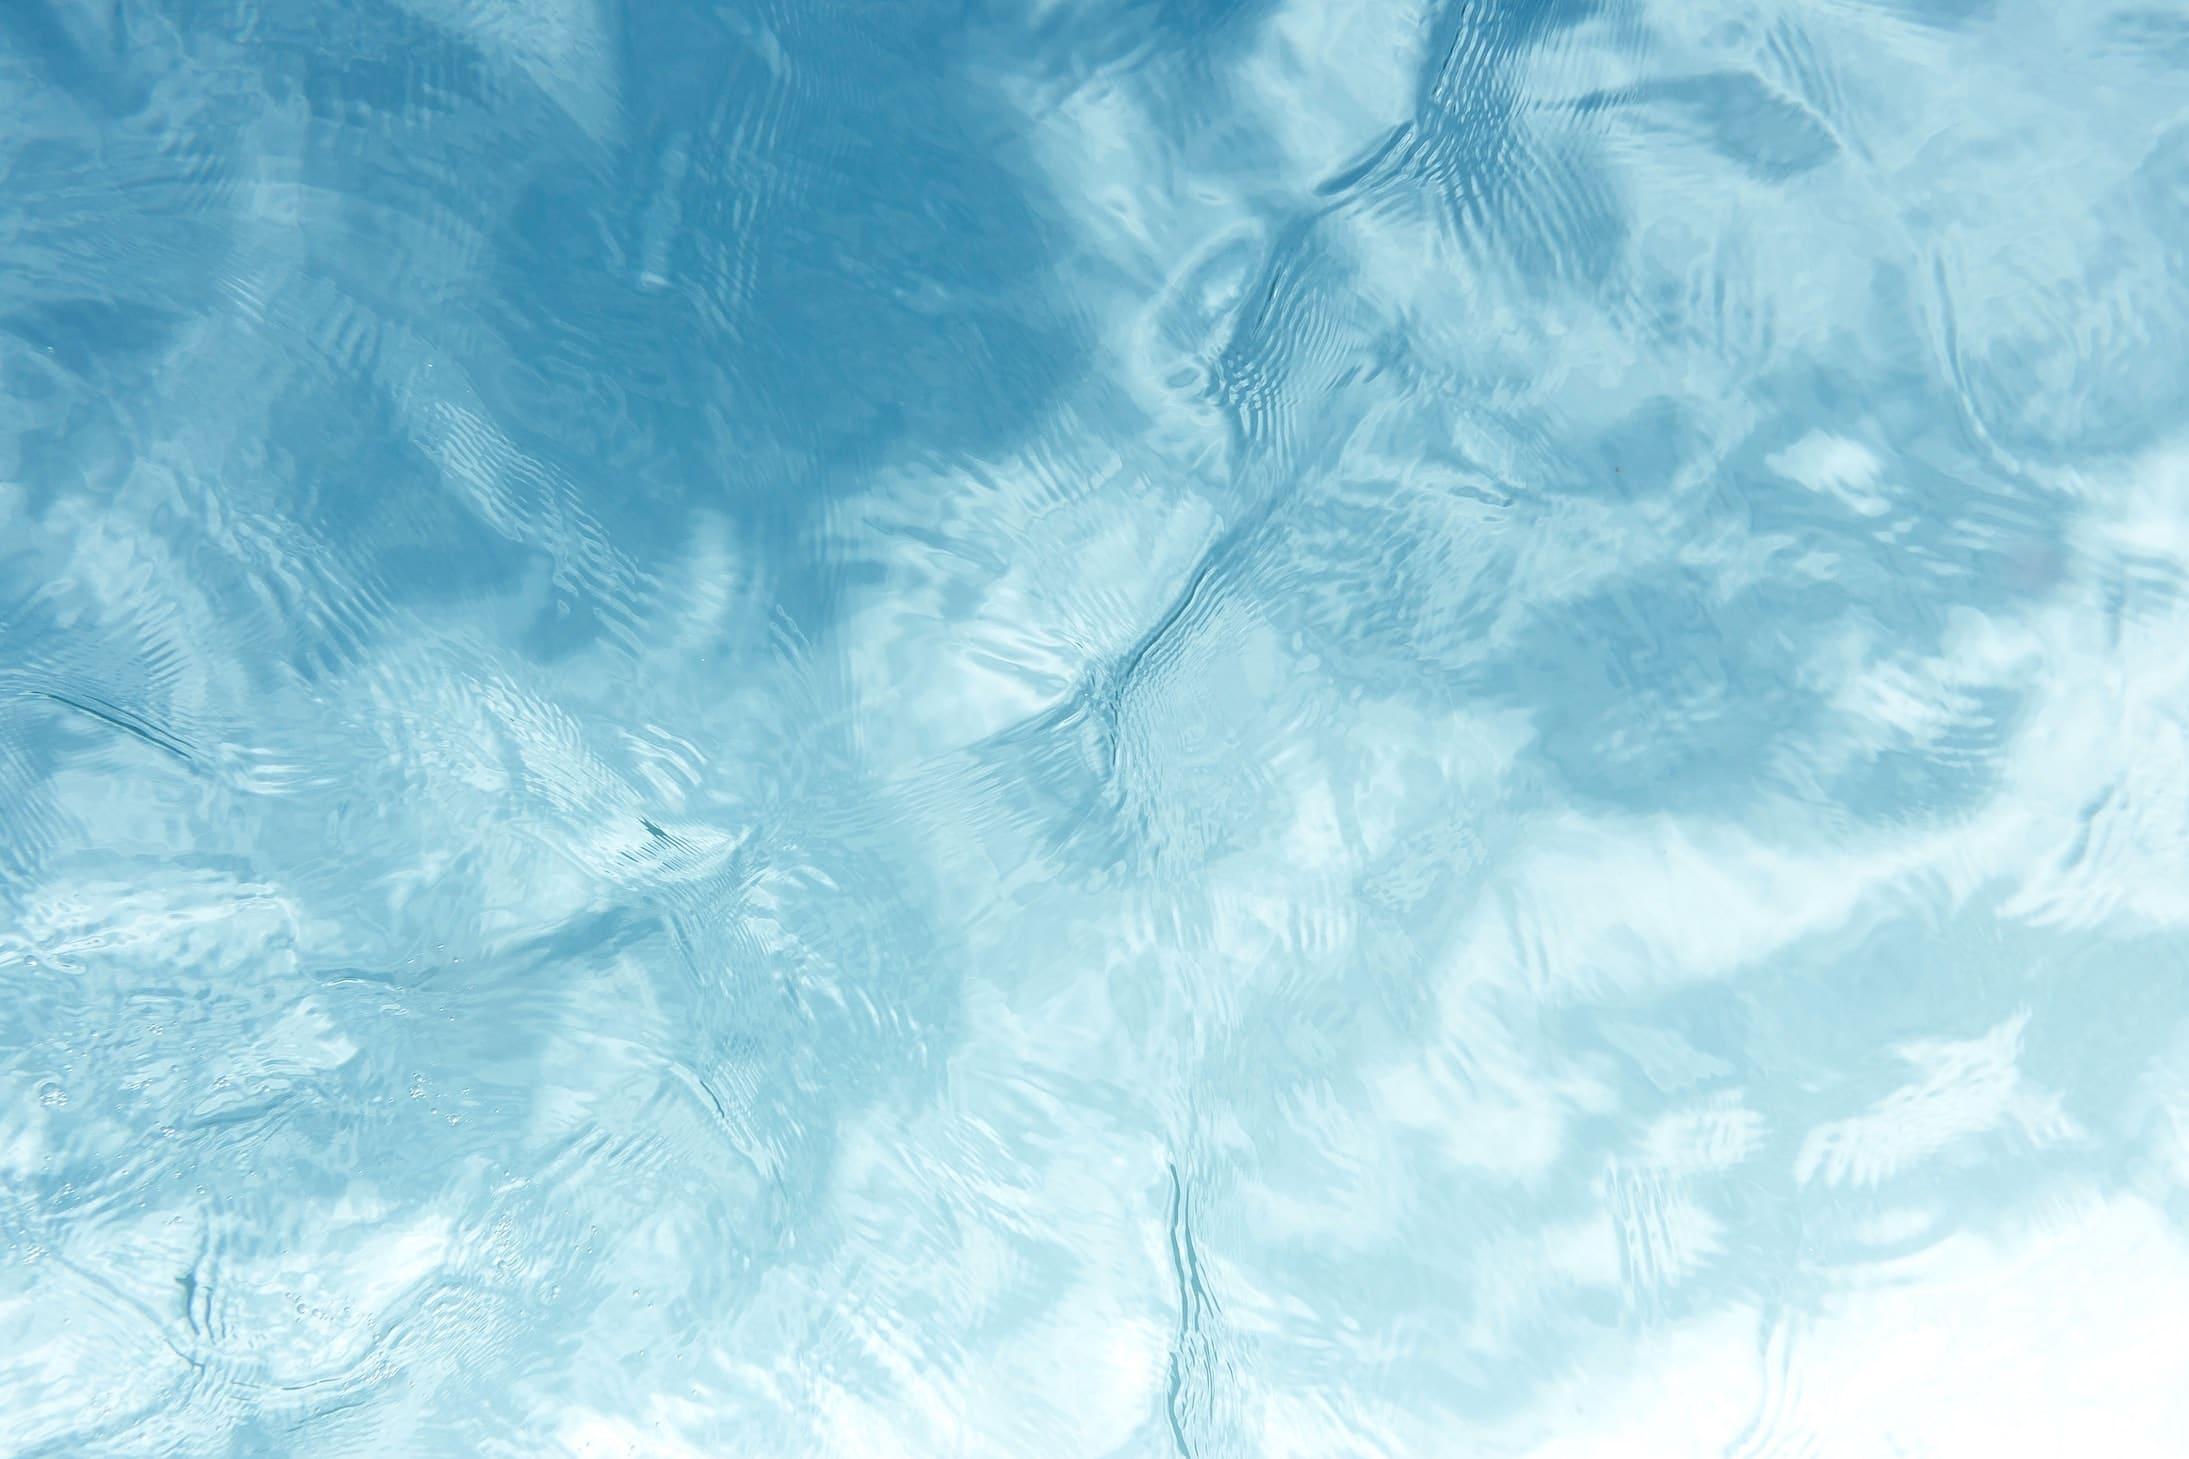 Water copy